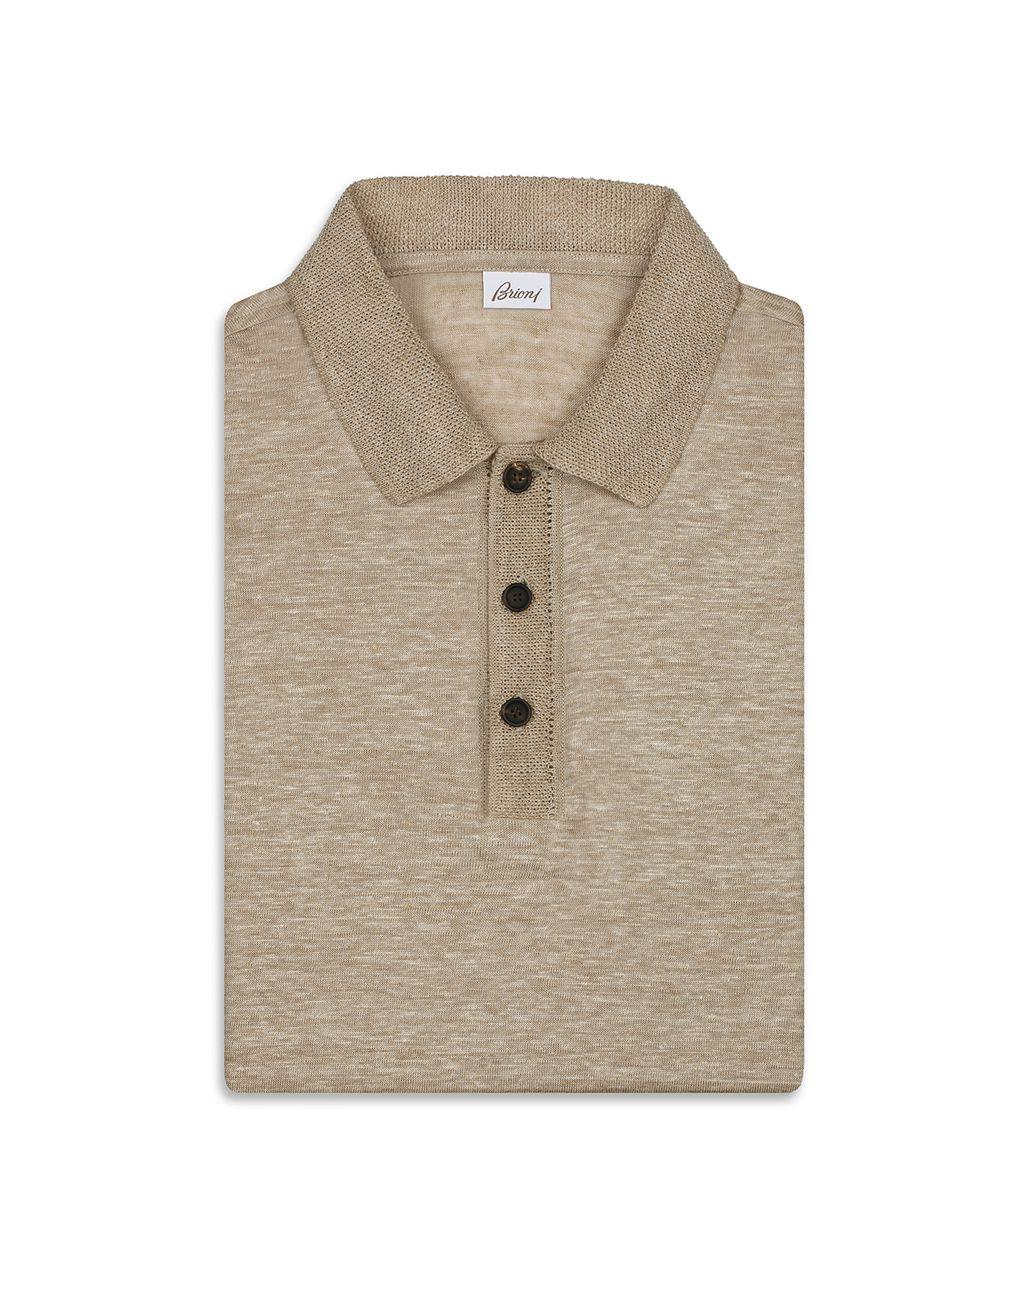 BRIONI Beige Linen Polo Shirt T-Shirts & Polos Man e